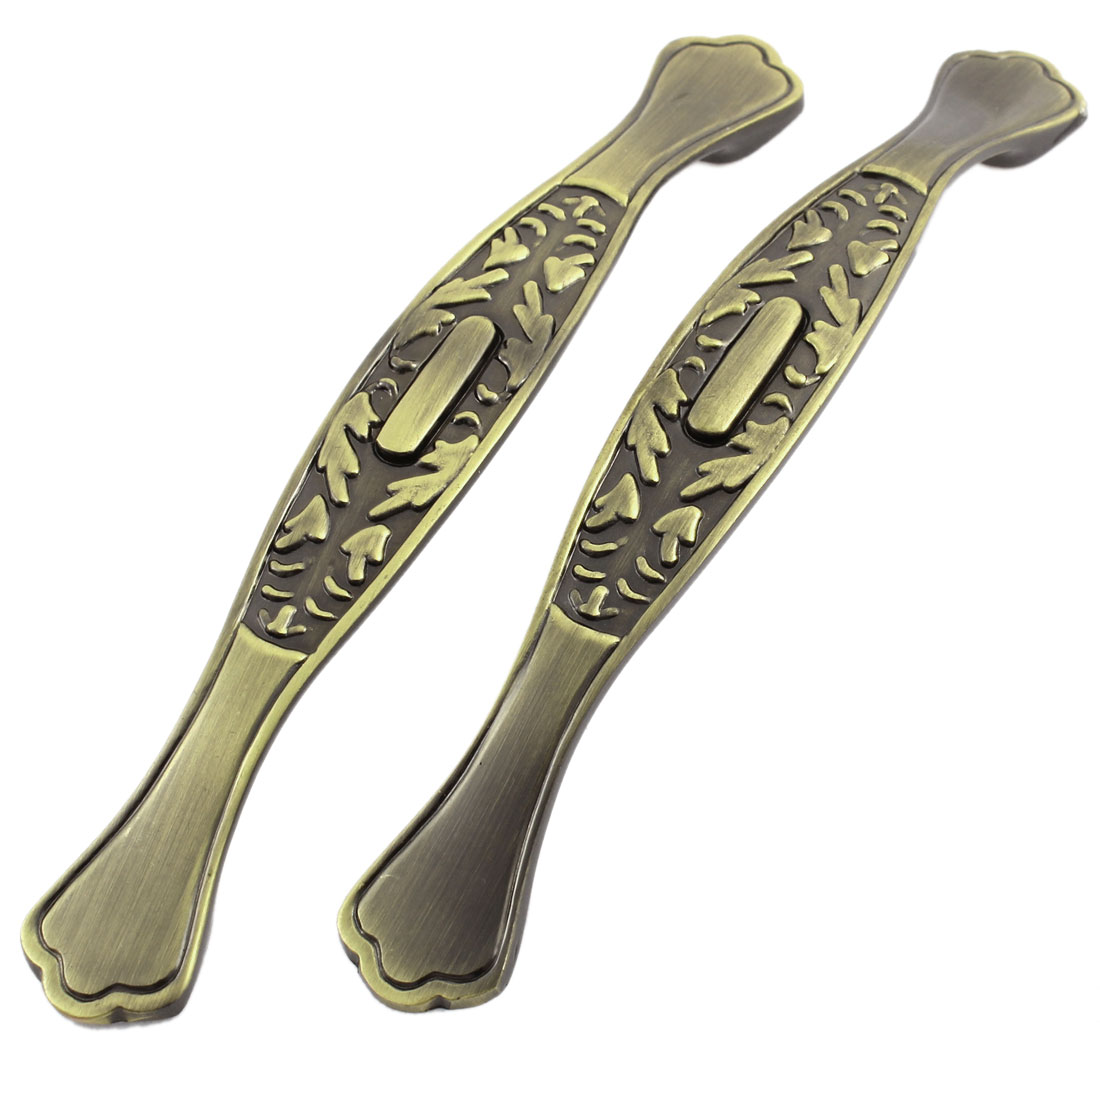 "2 Pcs Brown Tone Zinc Alloy Arch Hardware Door Pull Handle Handgrip 6"" Length"